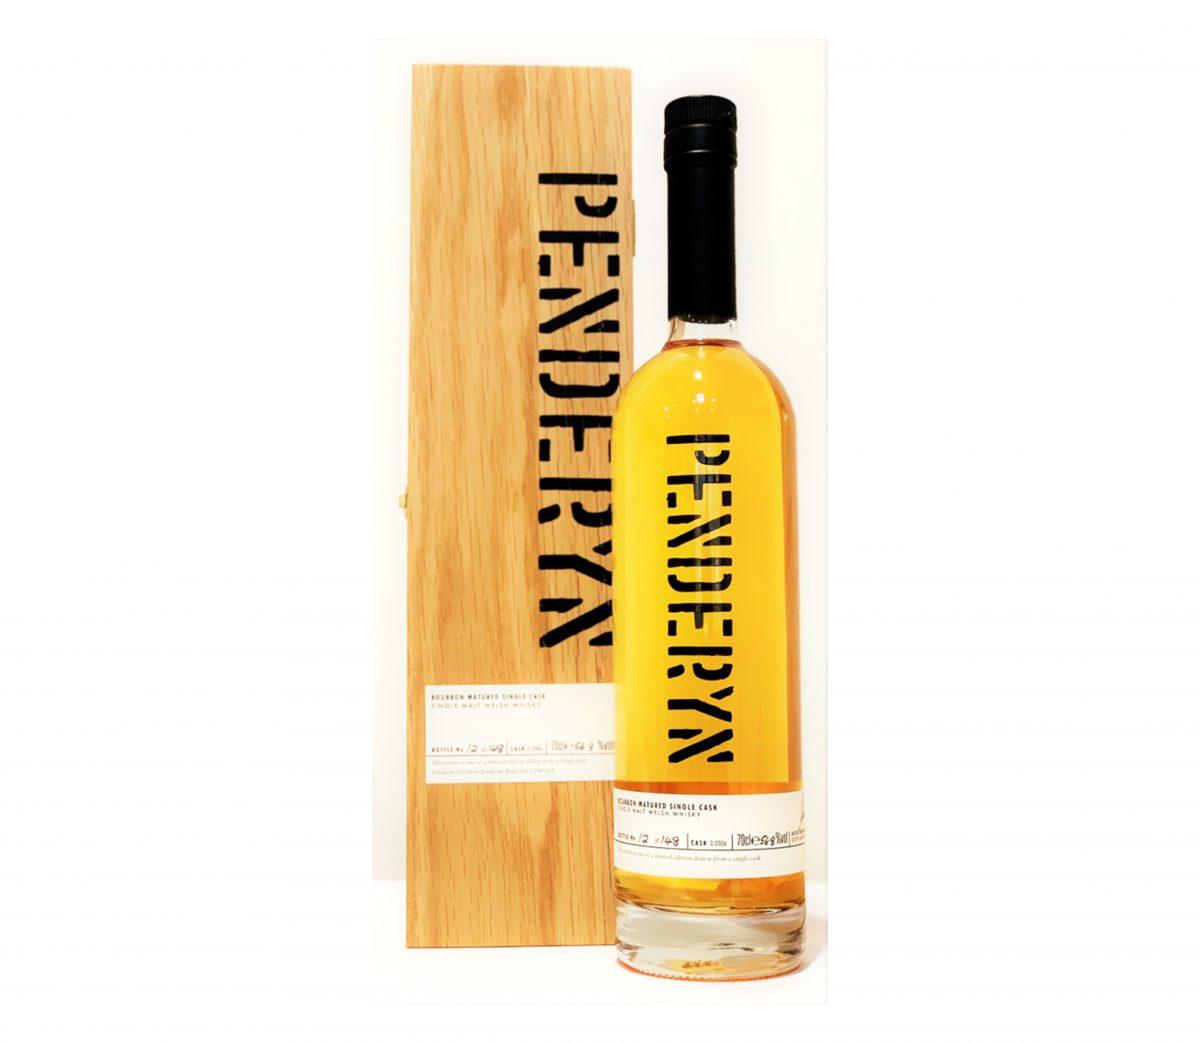 Penderyn Bourbon Matured Single Cask